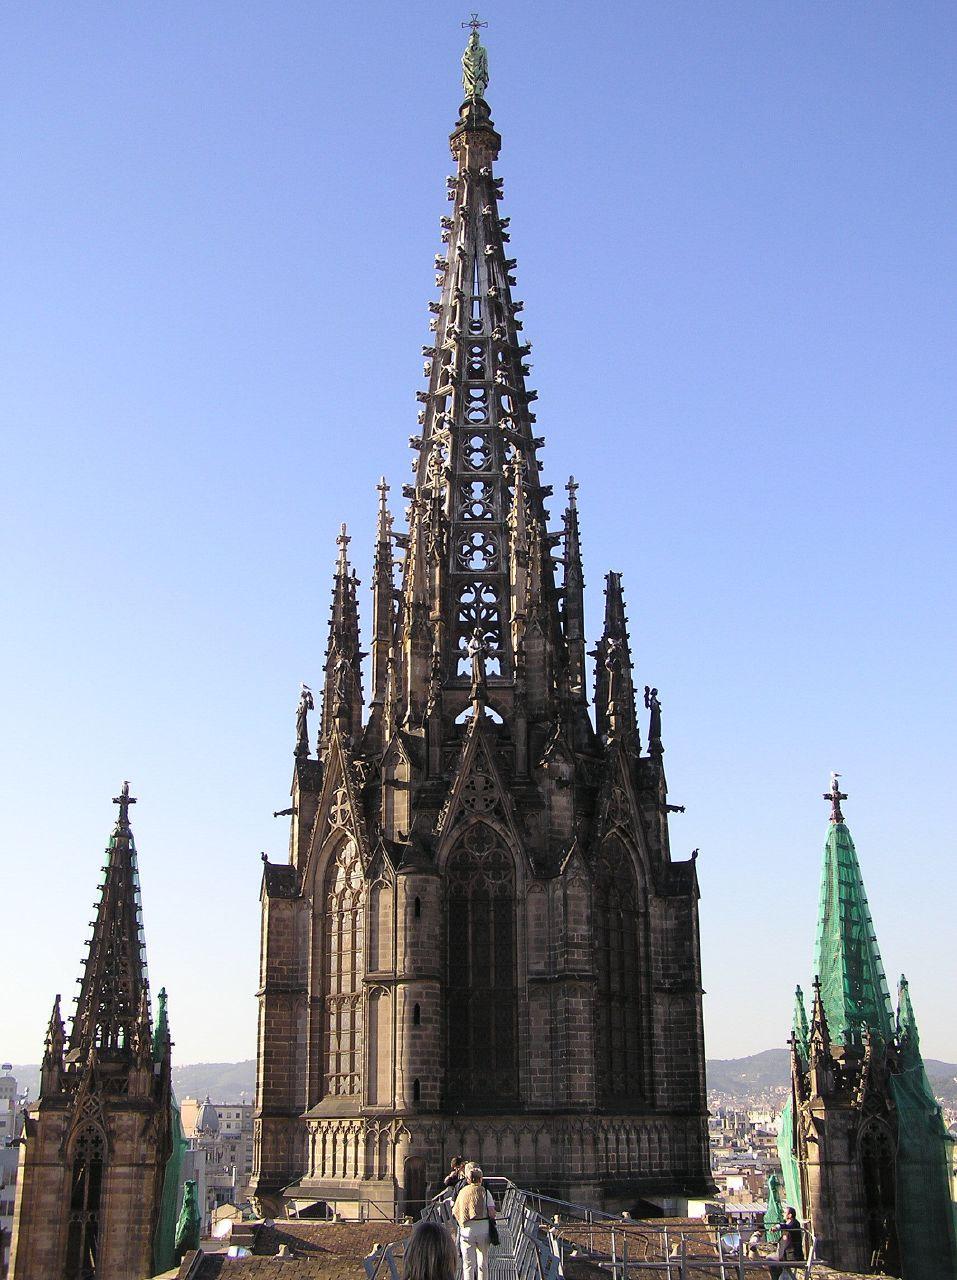 ...ral) 巴塞罗那大教堂的主体建于13-15世纪,教堂的正立面直到19